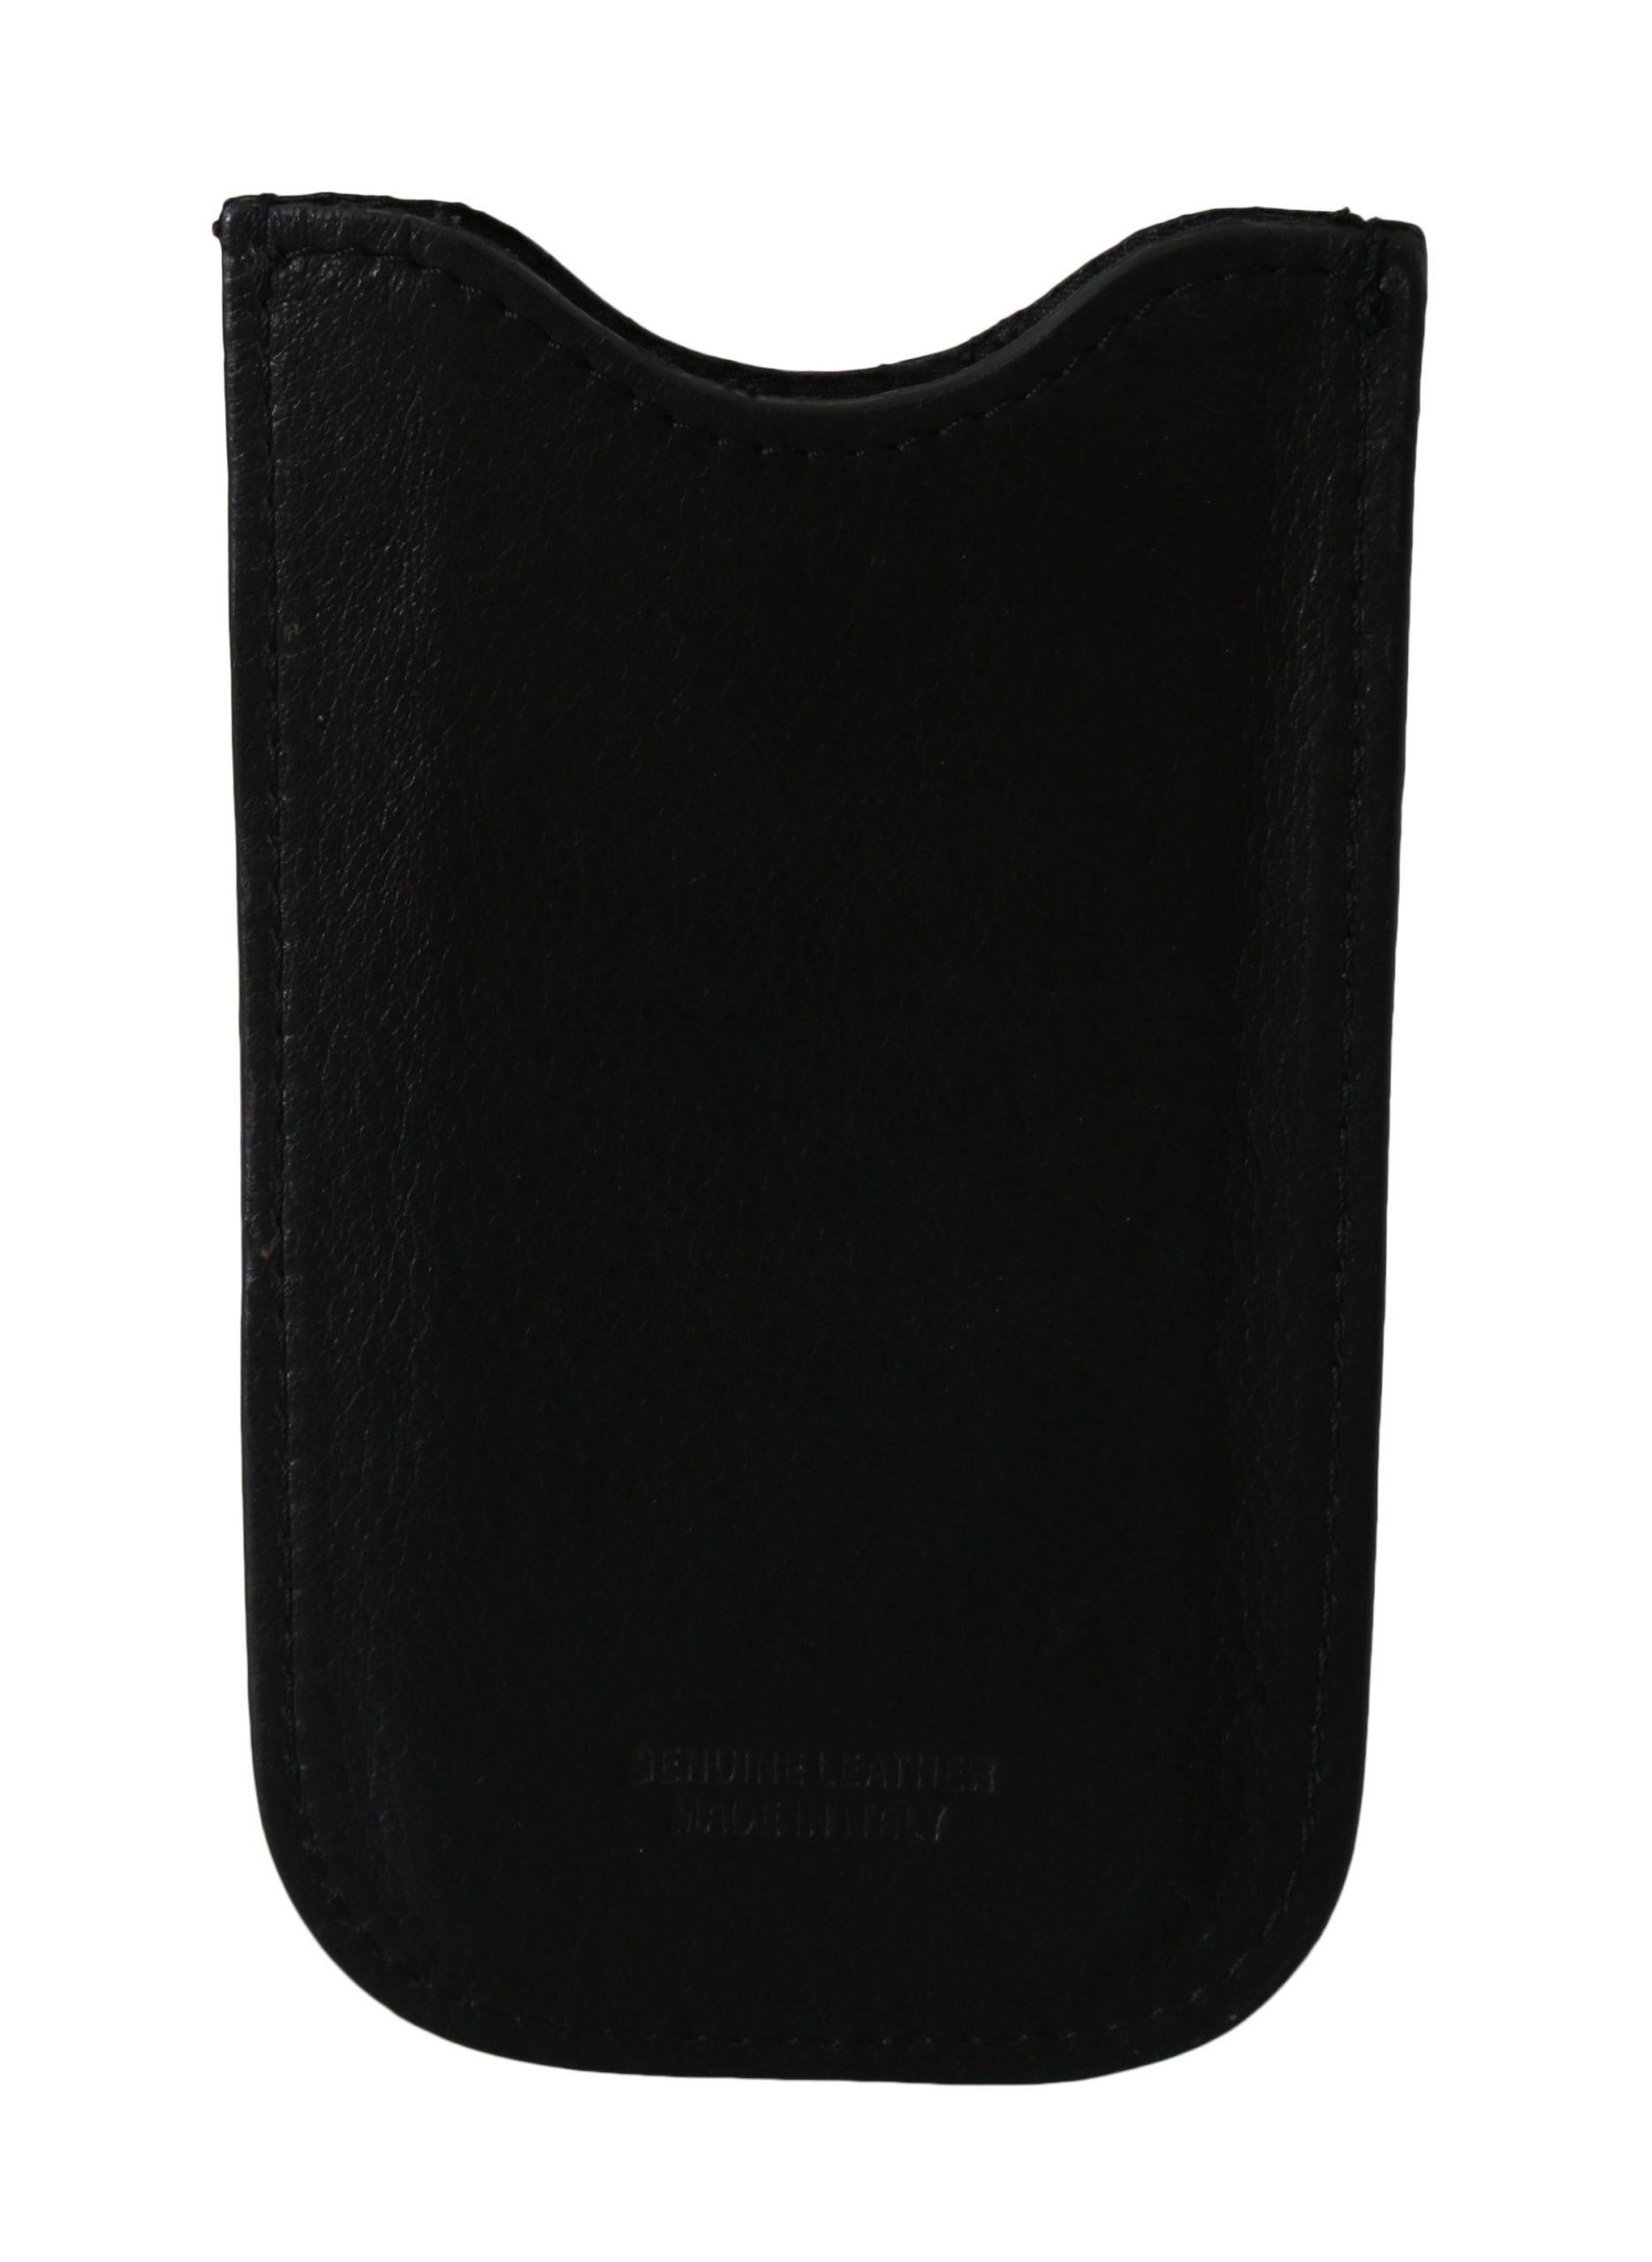 John Galliano Men's Leather Multifunctional Wallet Black VAS8846